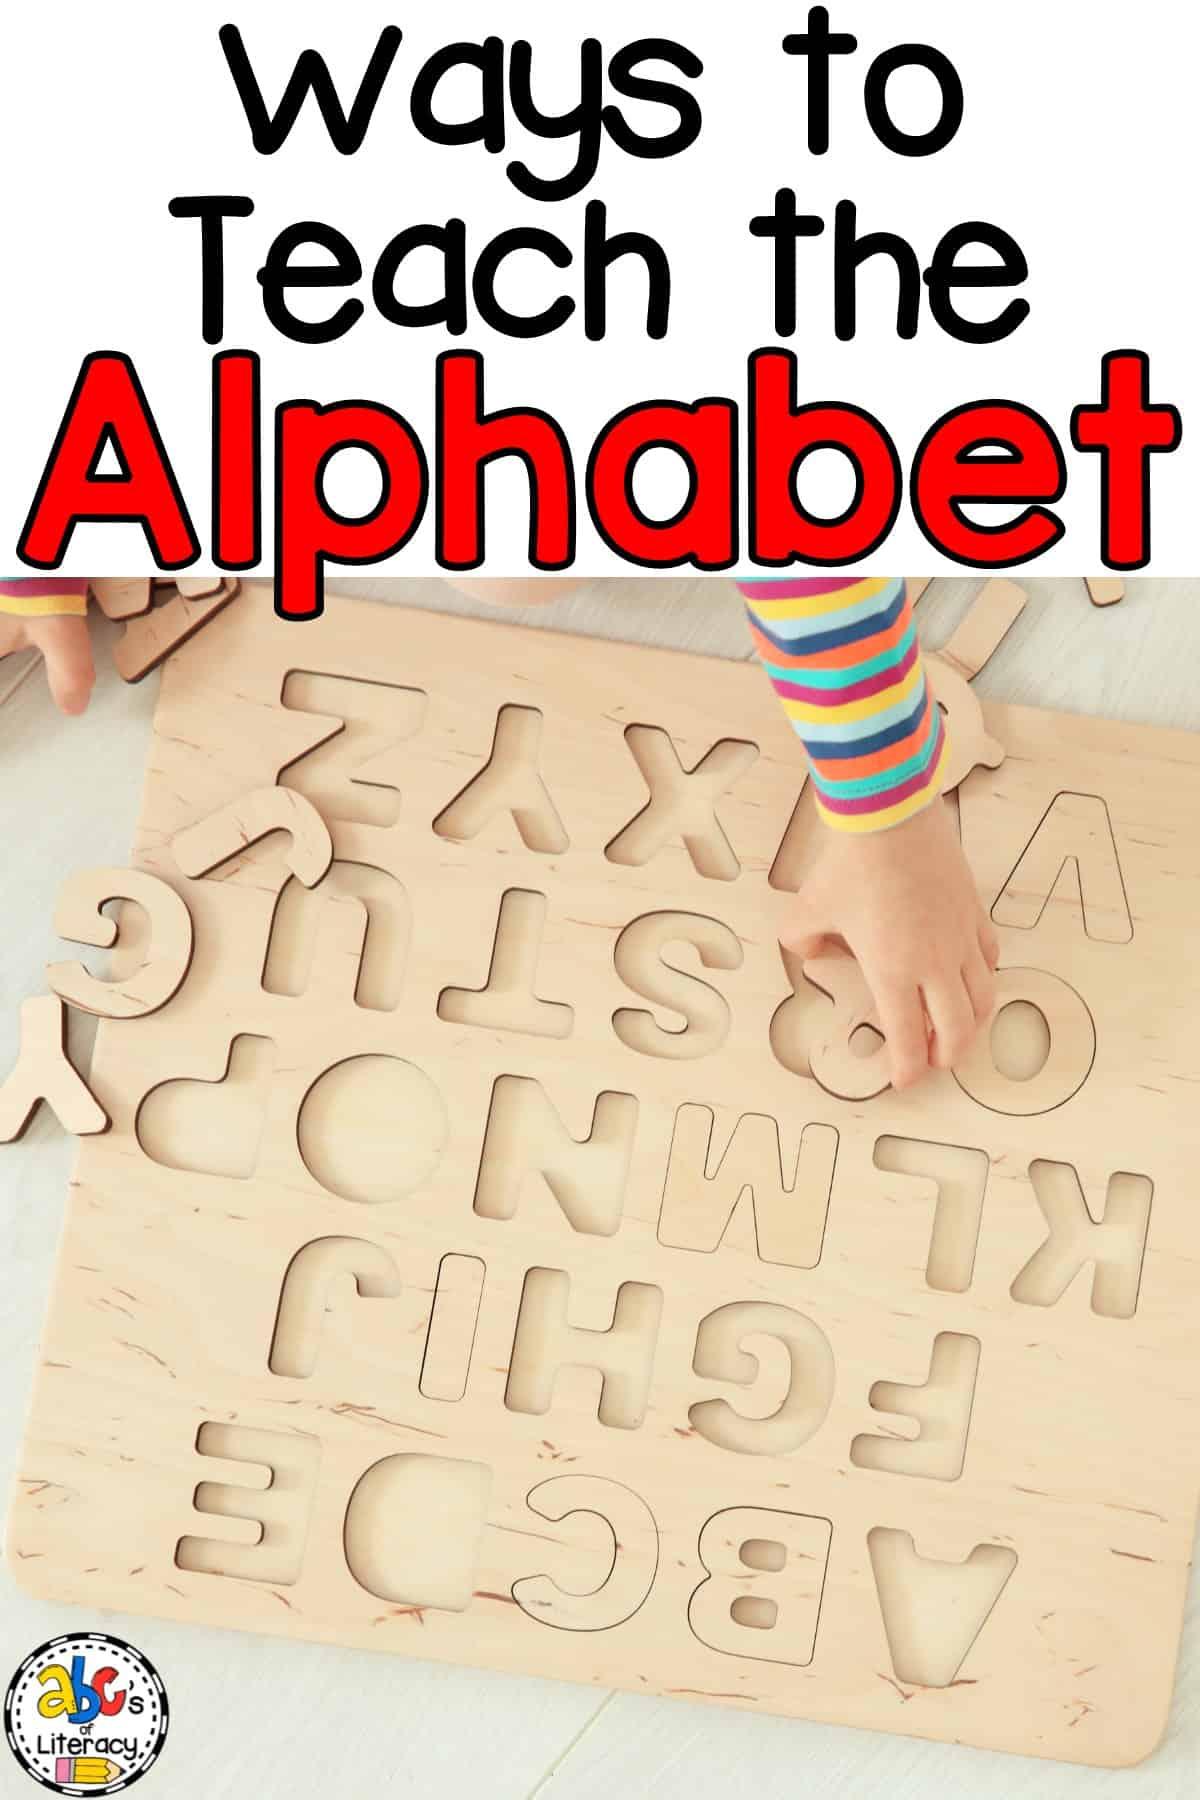 Way To Teach The Alphabet